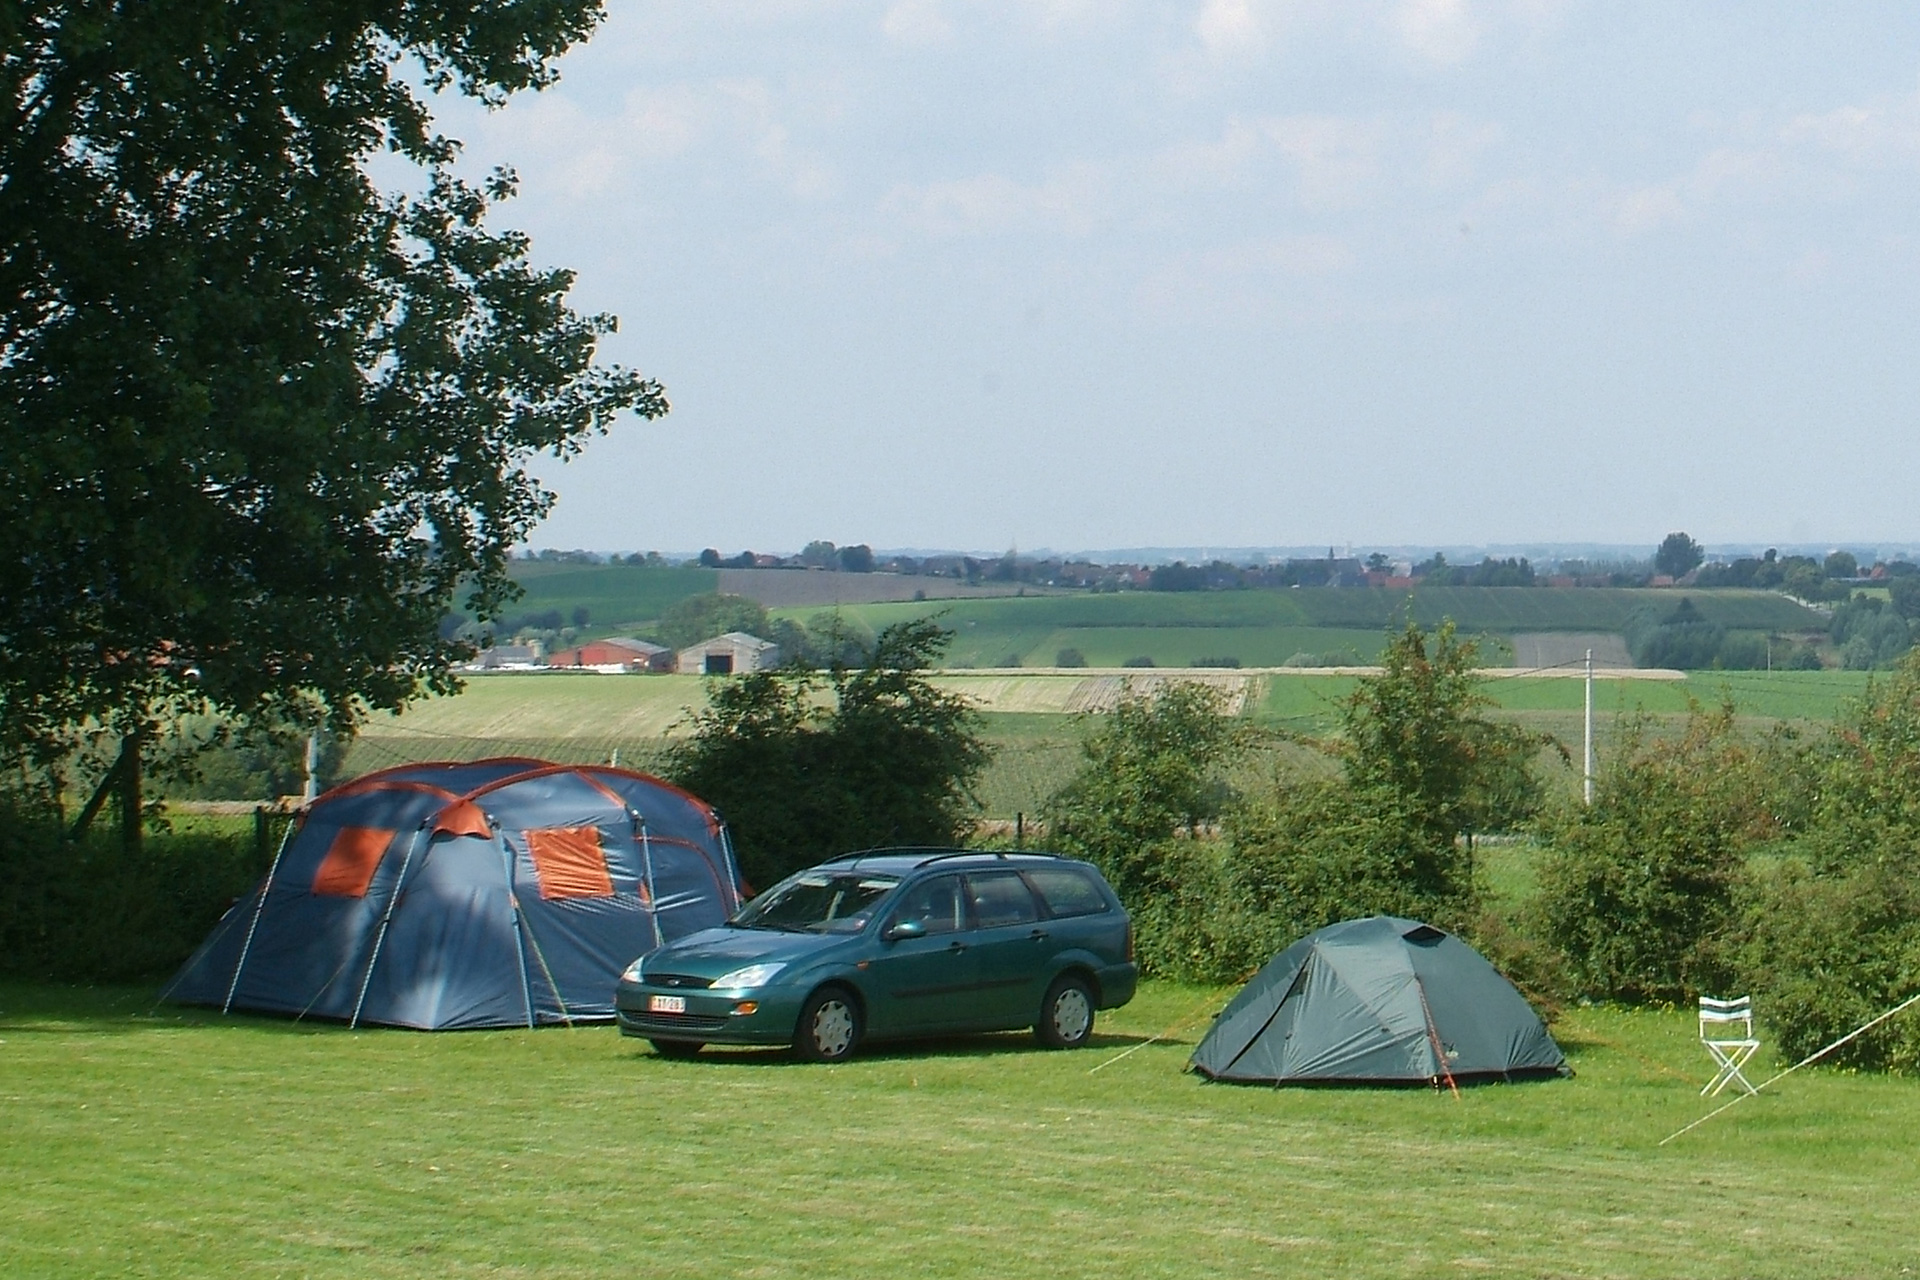 Camping Ypra - Camping Ypra